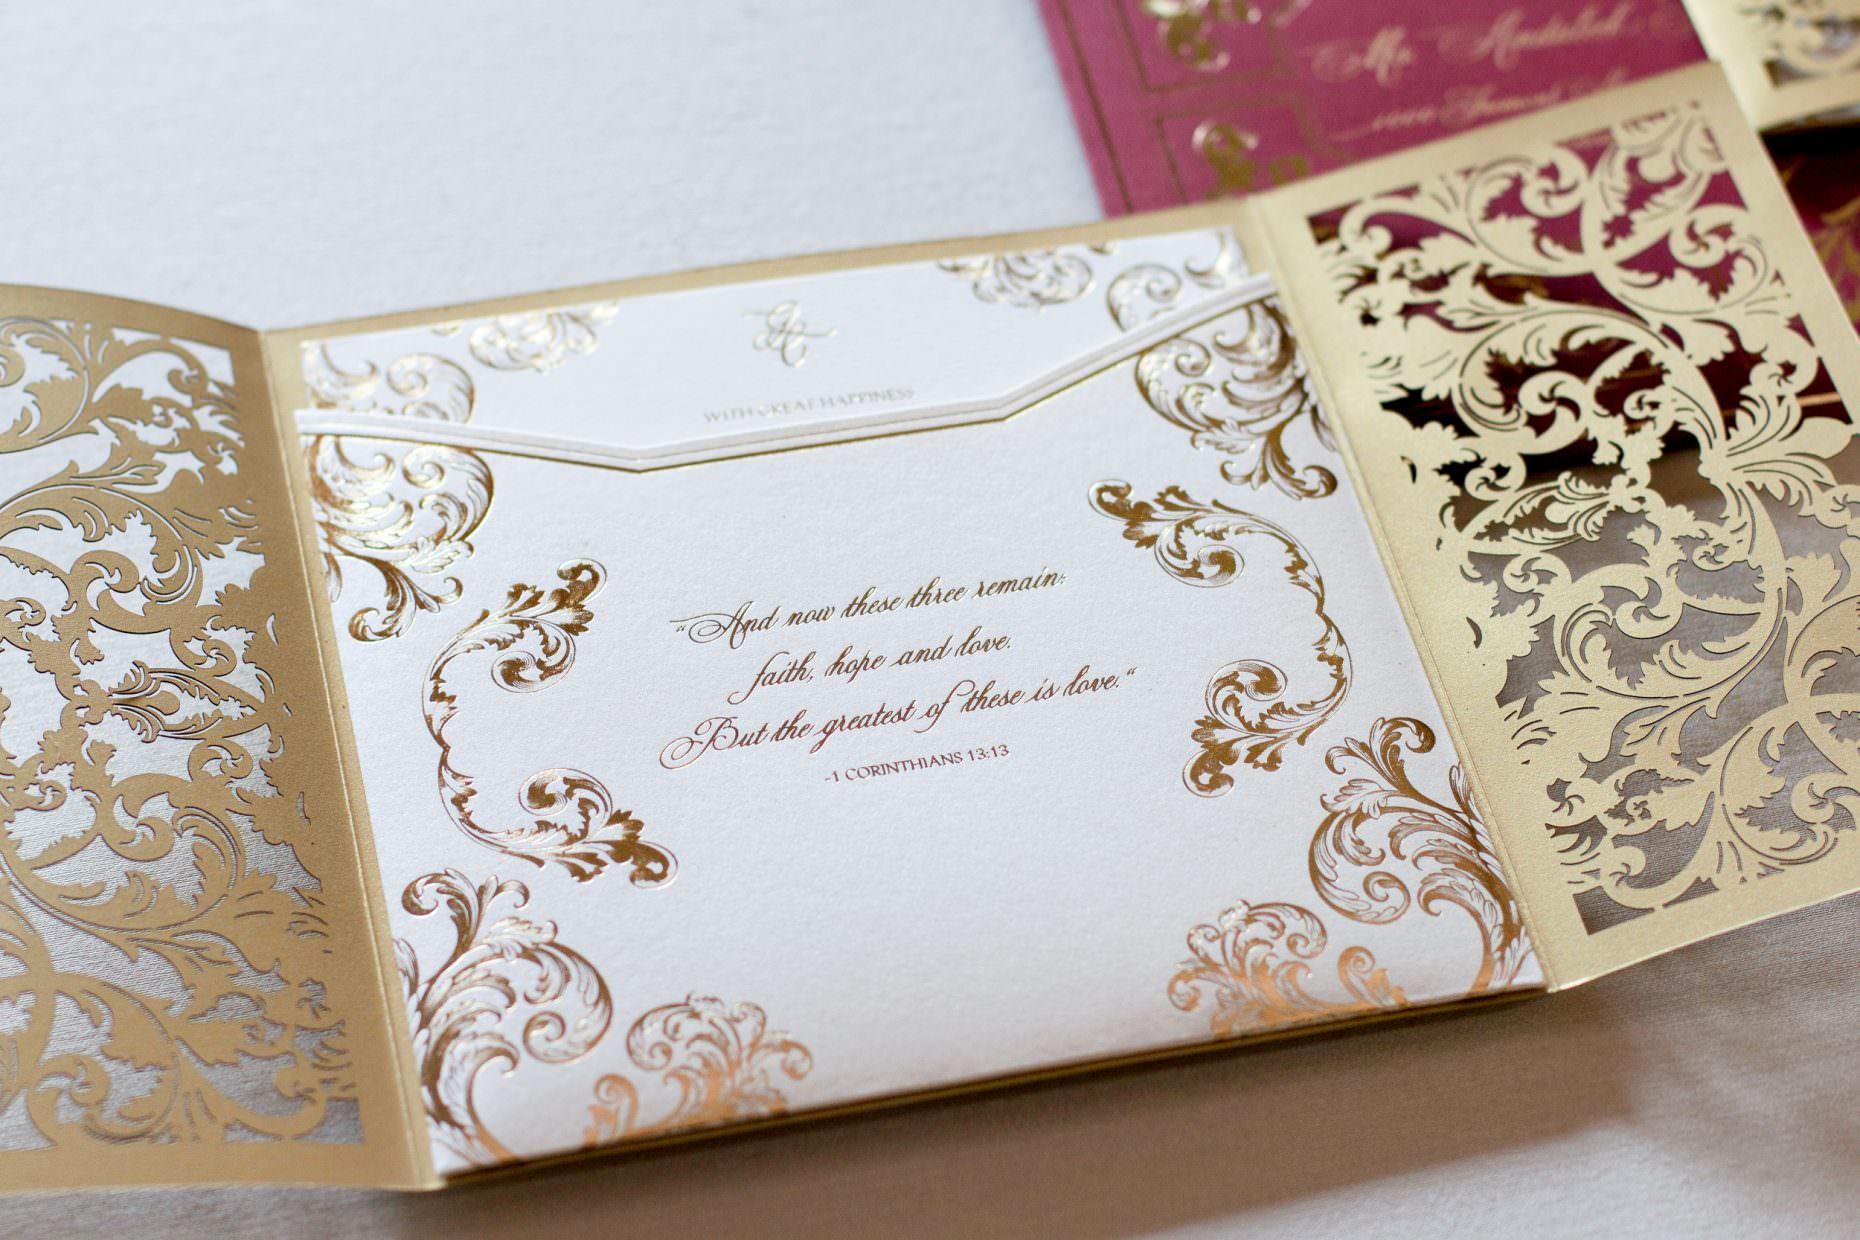 Pocket Wedding Invitation With Quote